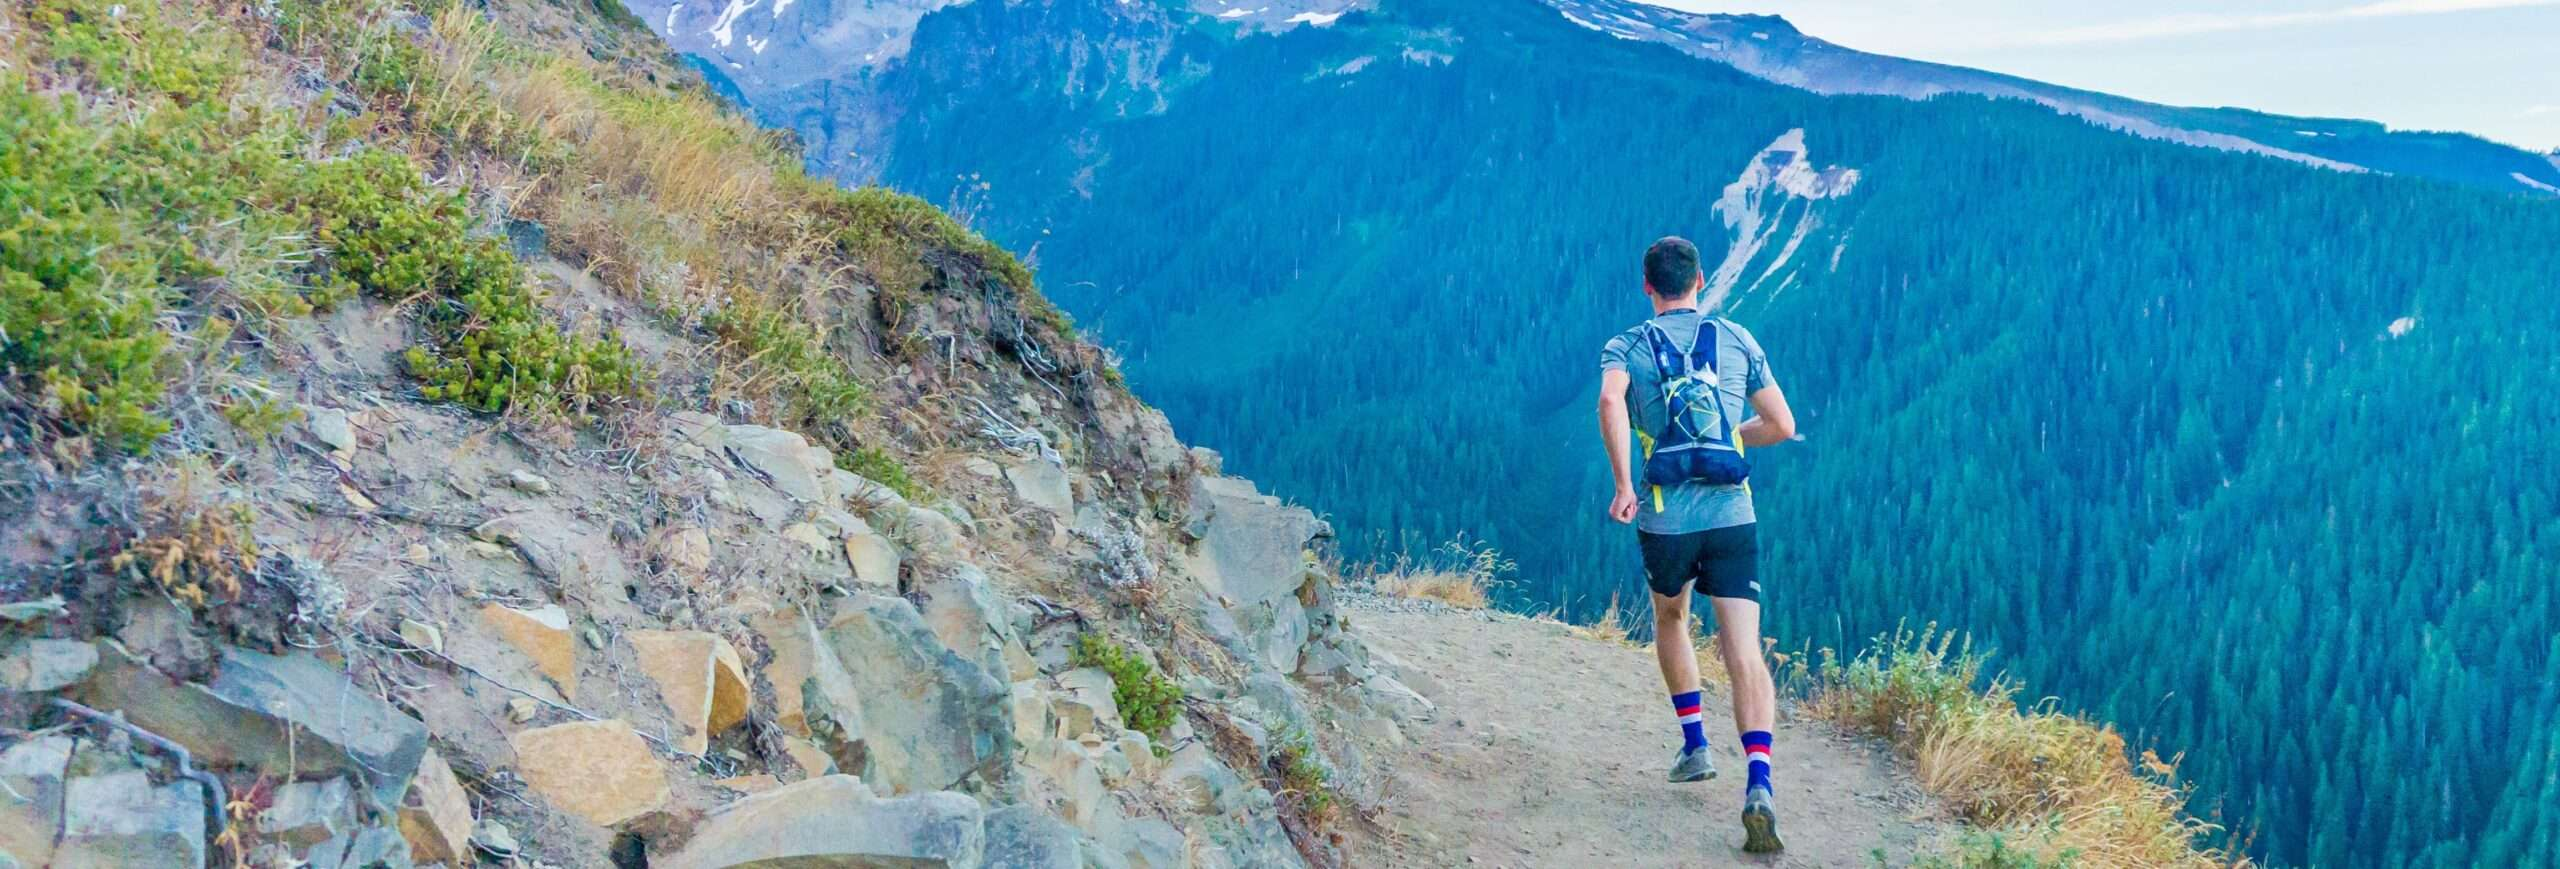 Best Budget Trail Running Shoes Photo Header